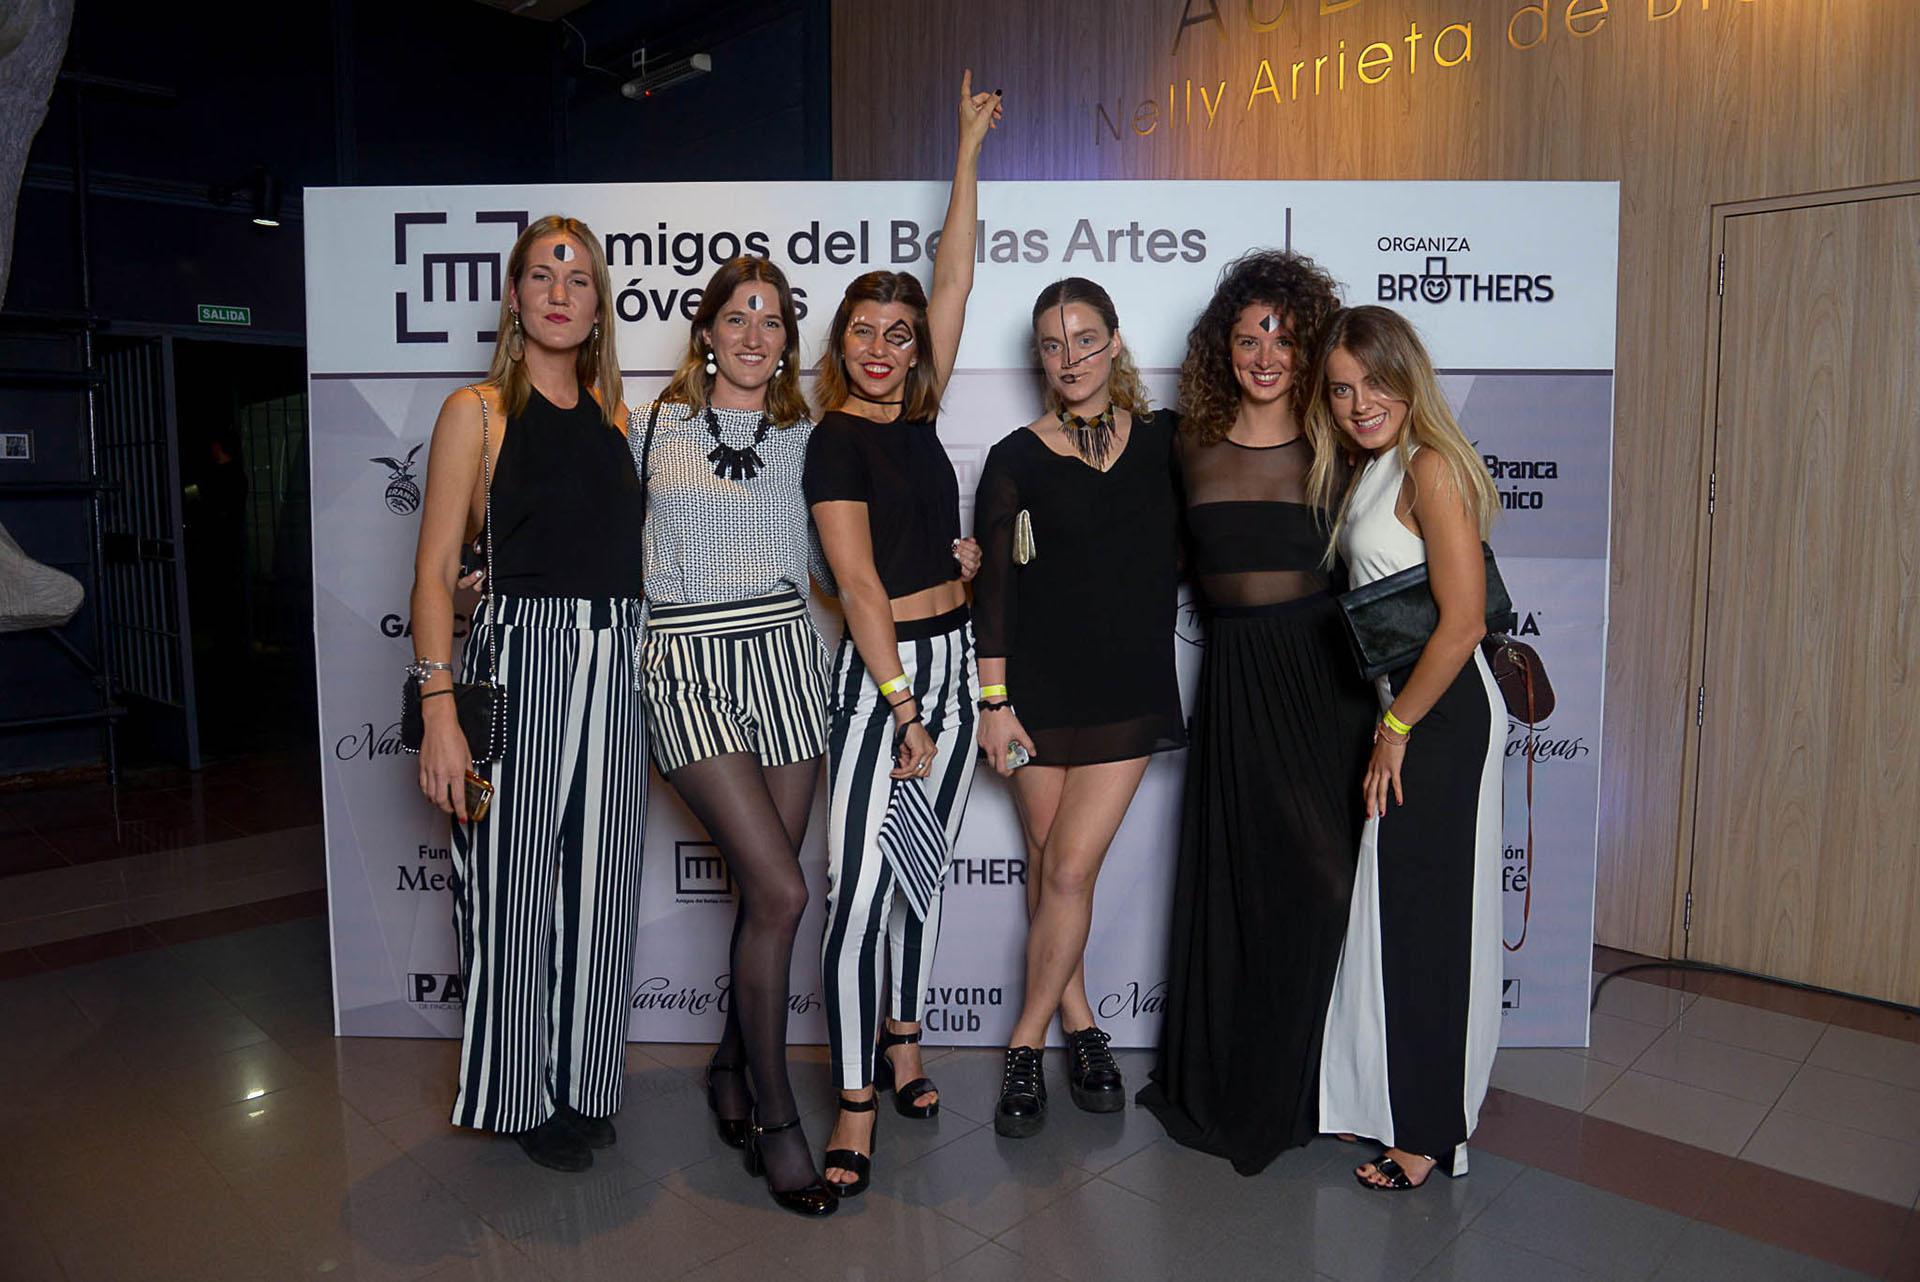 Agustina Gurmendi, Camila Gurmendi, Rosario Neuss, Stephanie Cameron, Milagros Avellaneda y Camila Duhau